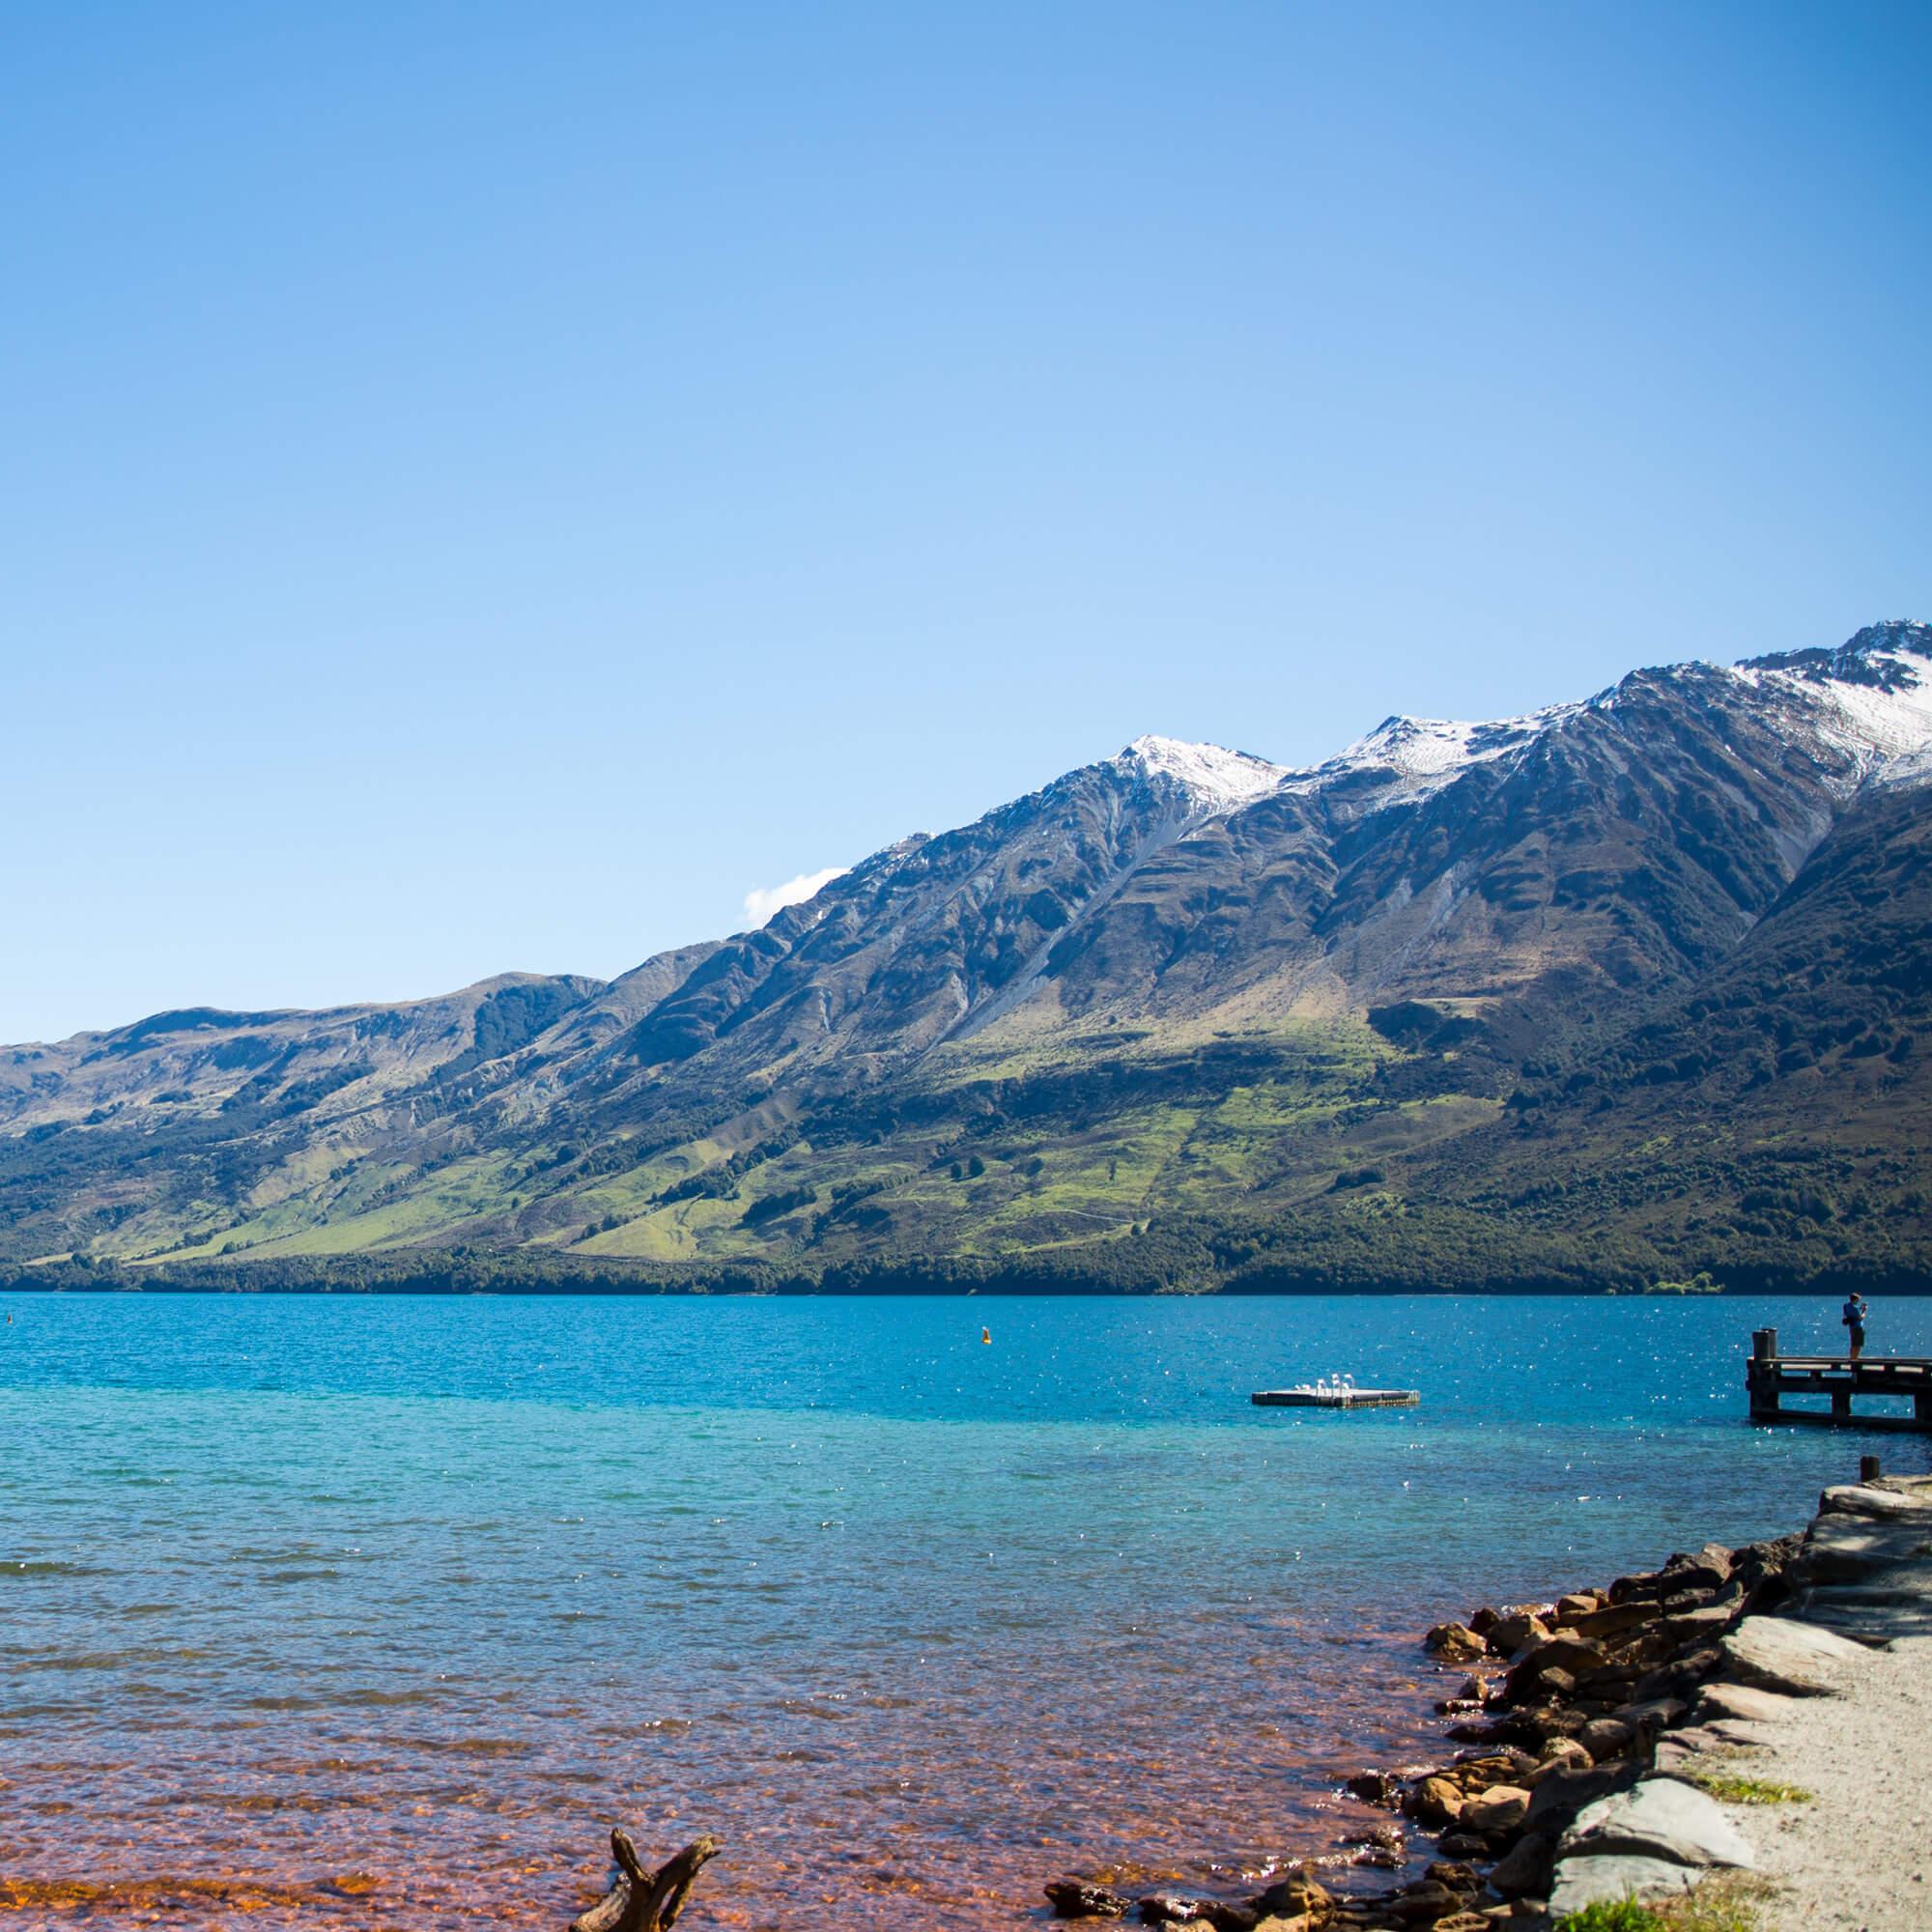 Mountains in Queenstown, New Zealand